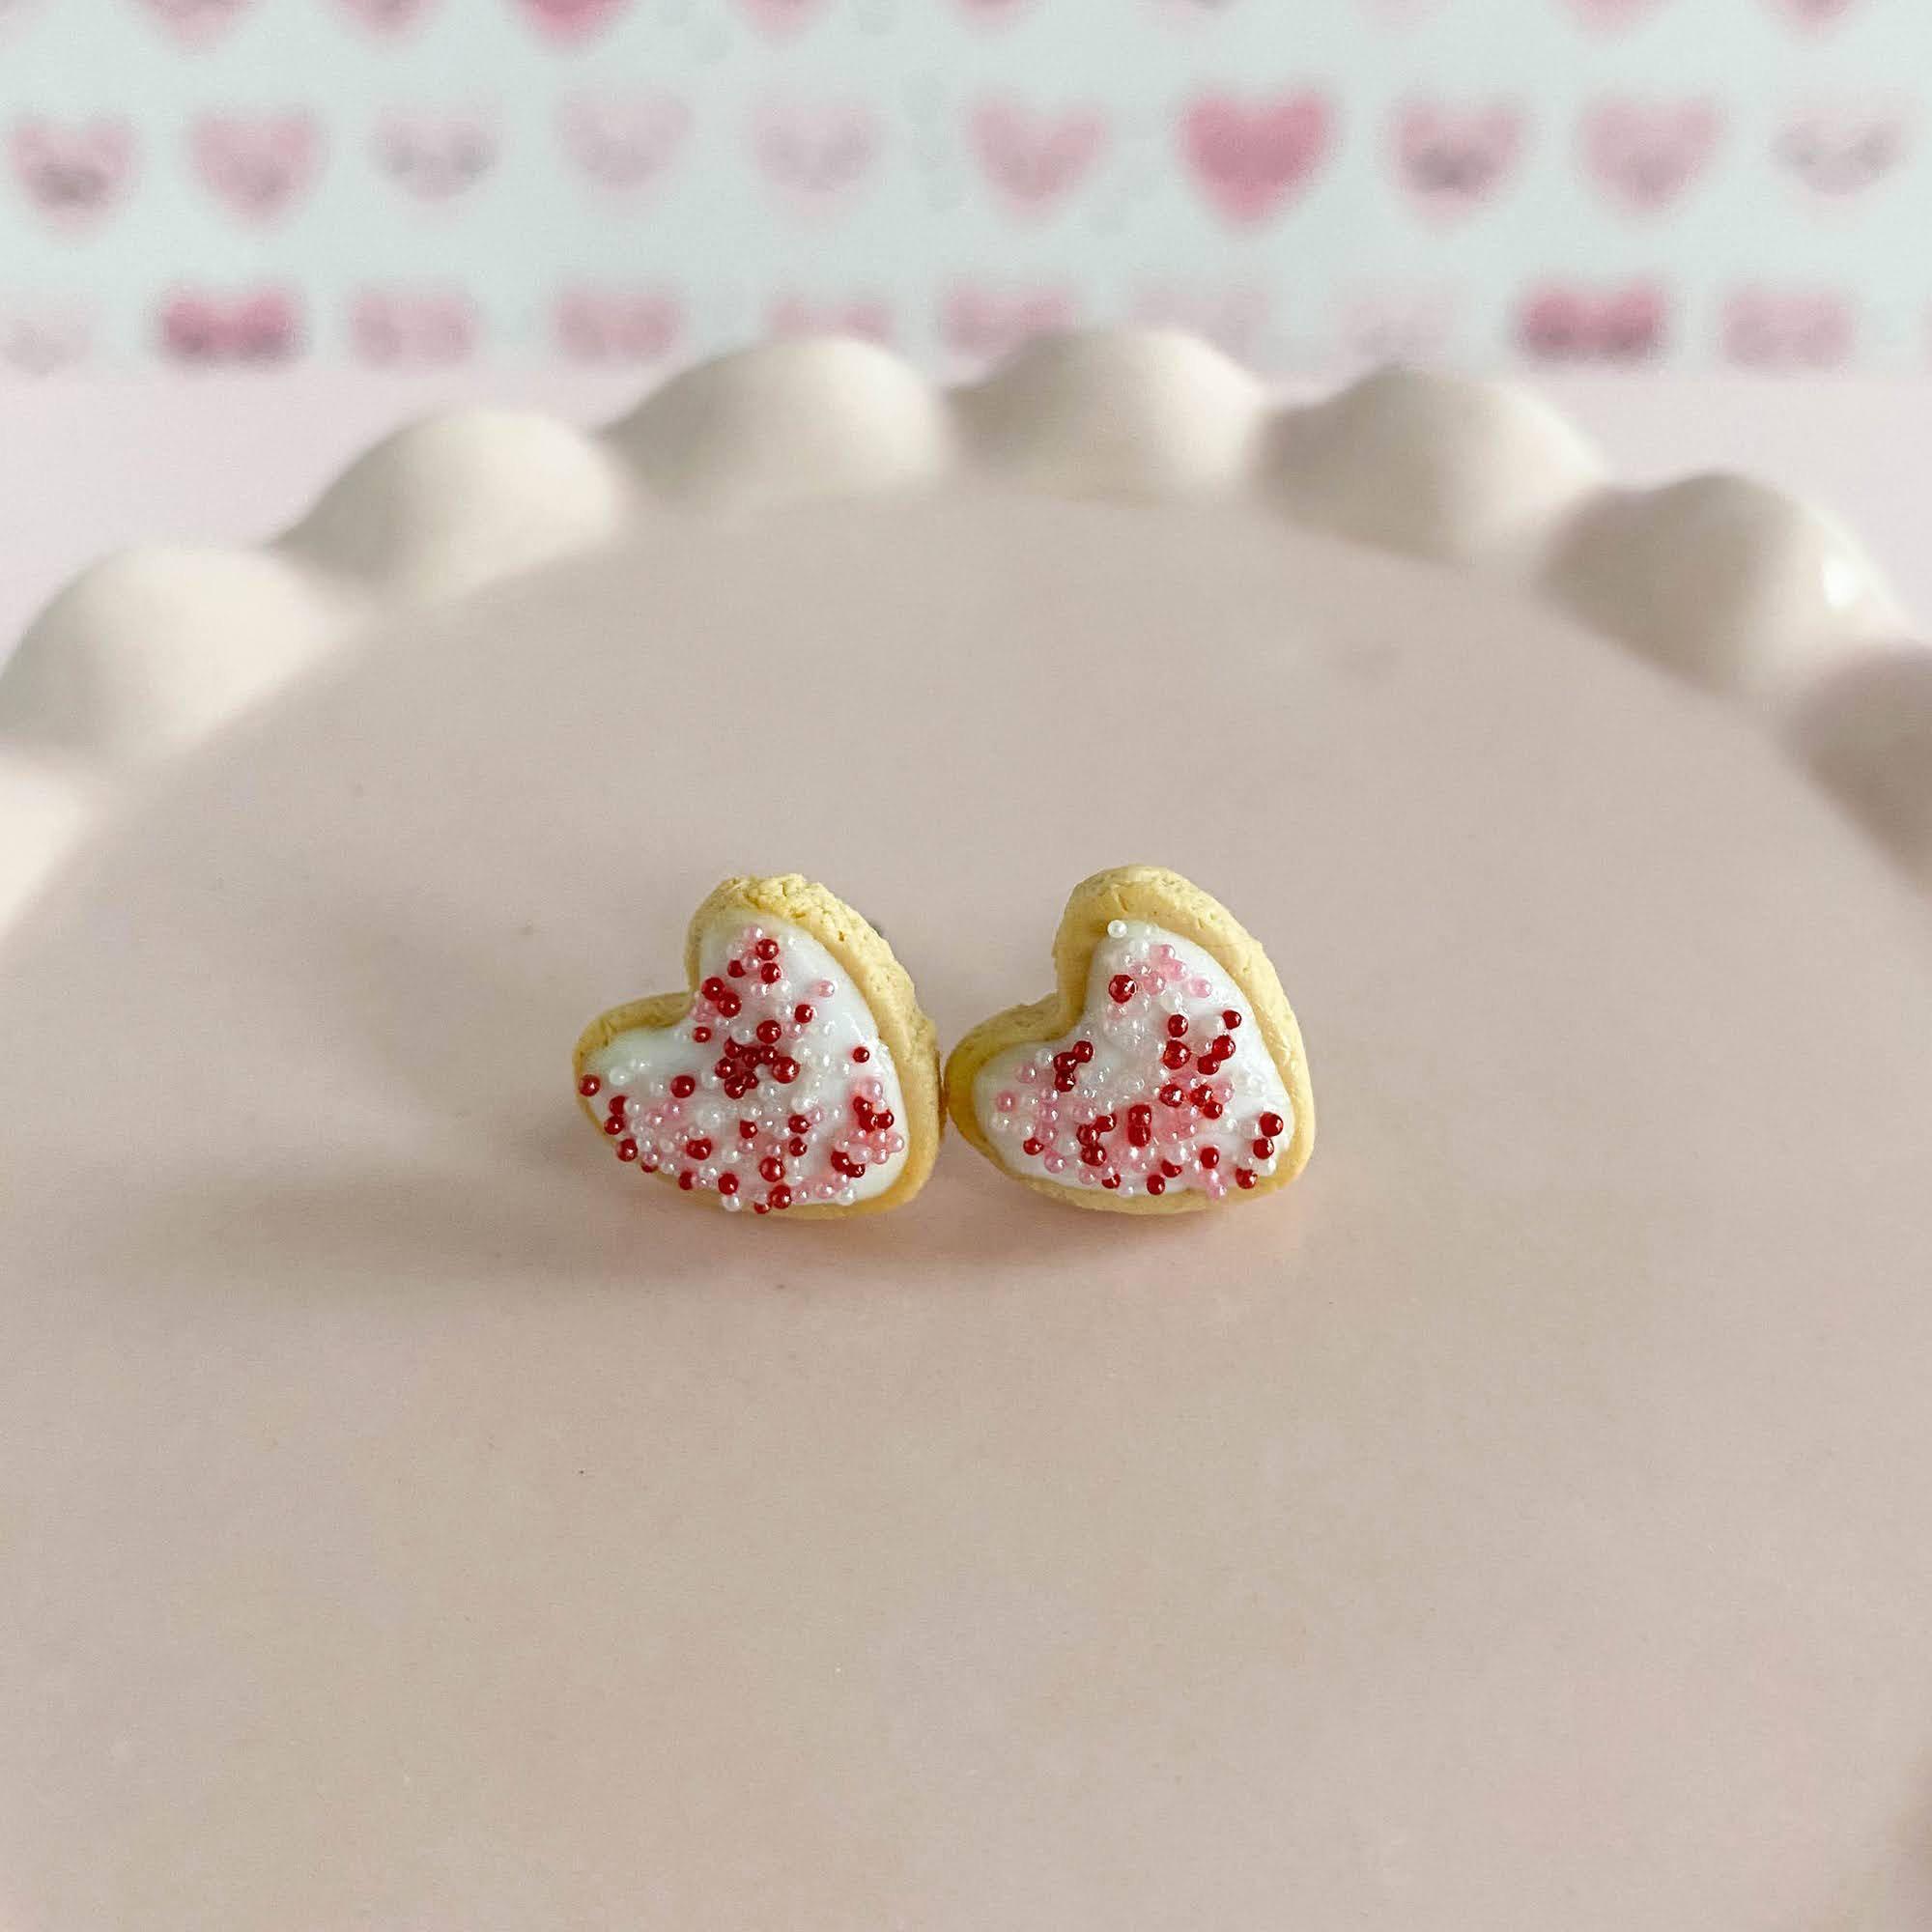 fireflyFrippery White Heart Sugar Cookie Earrings on Pink Display